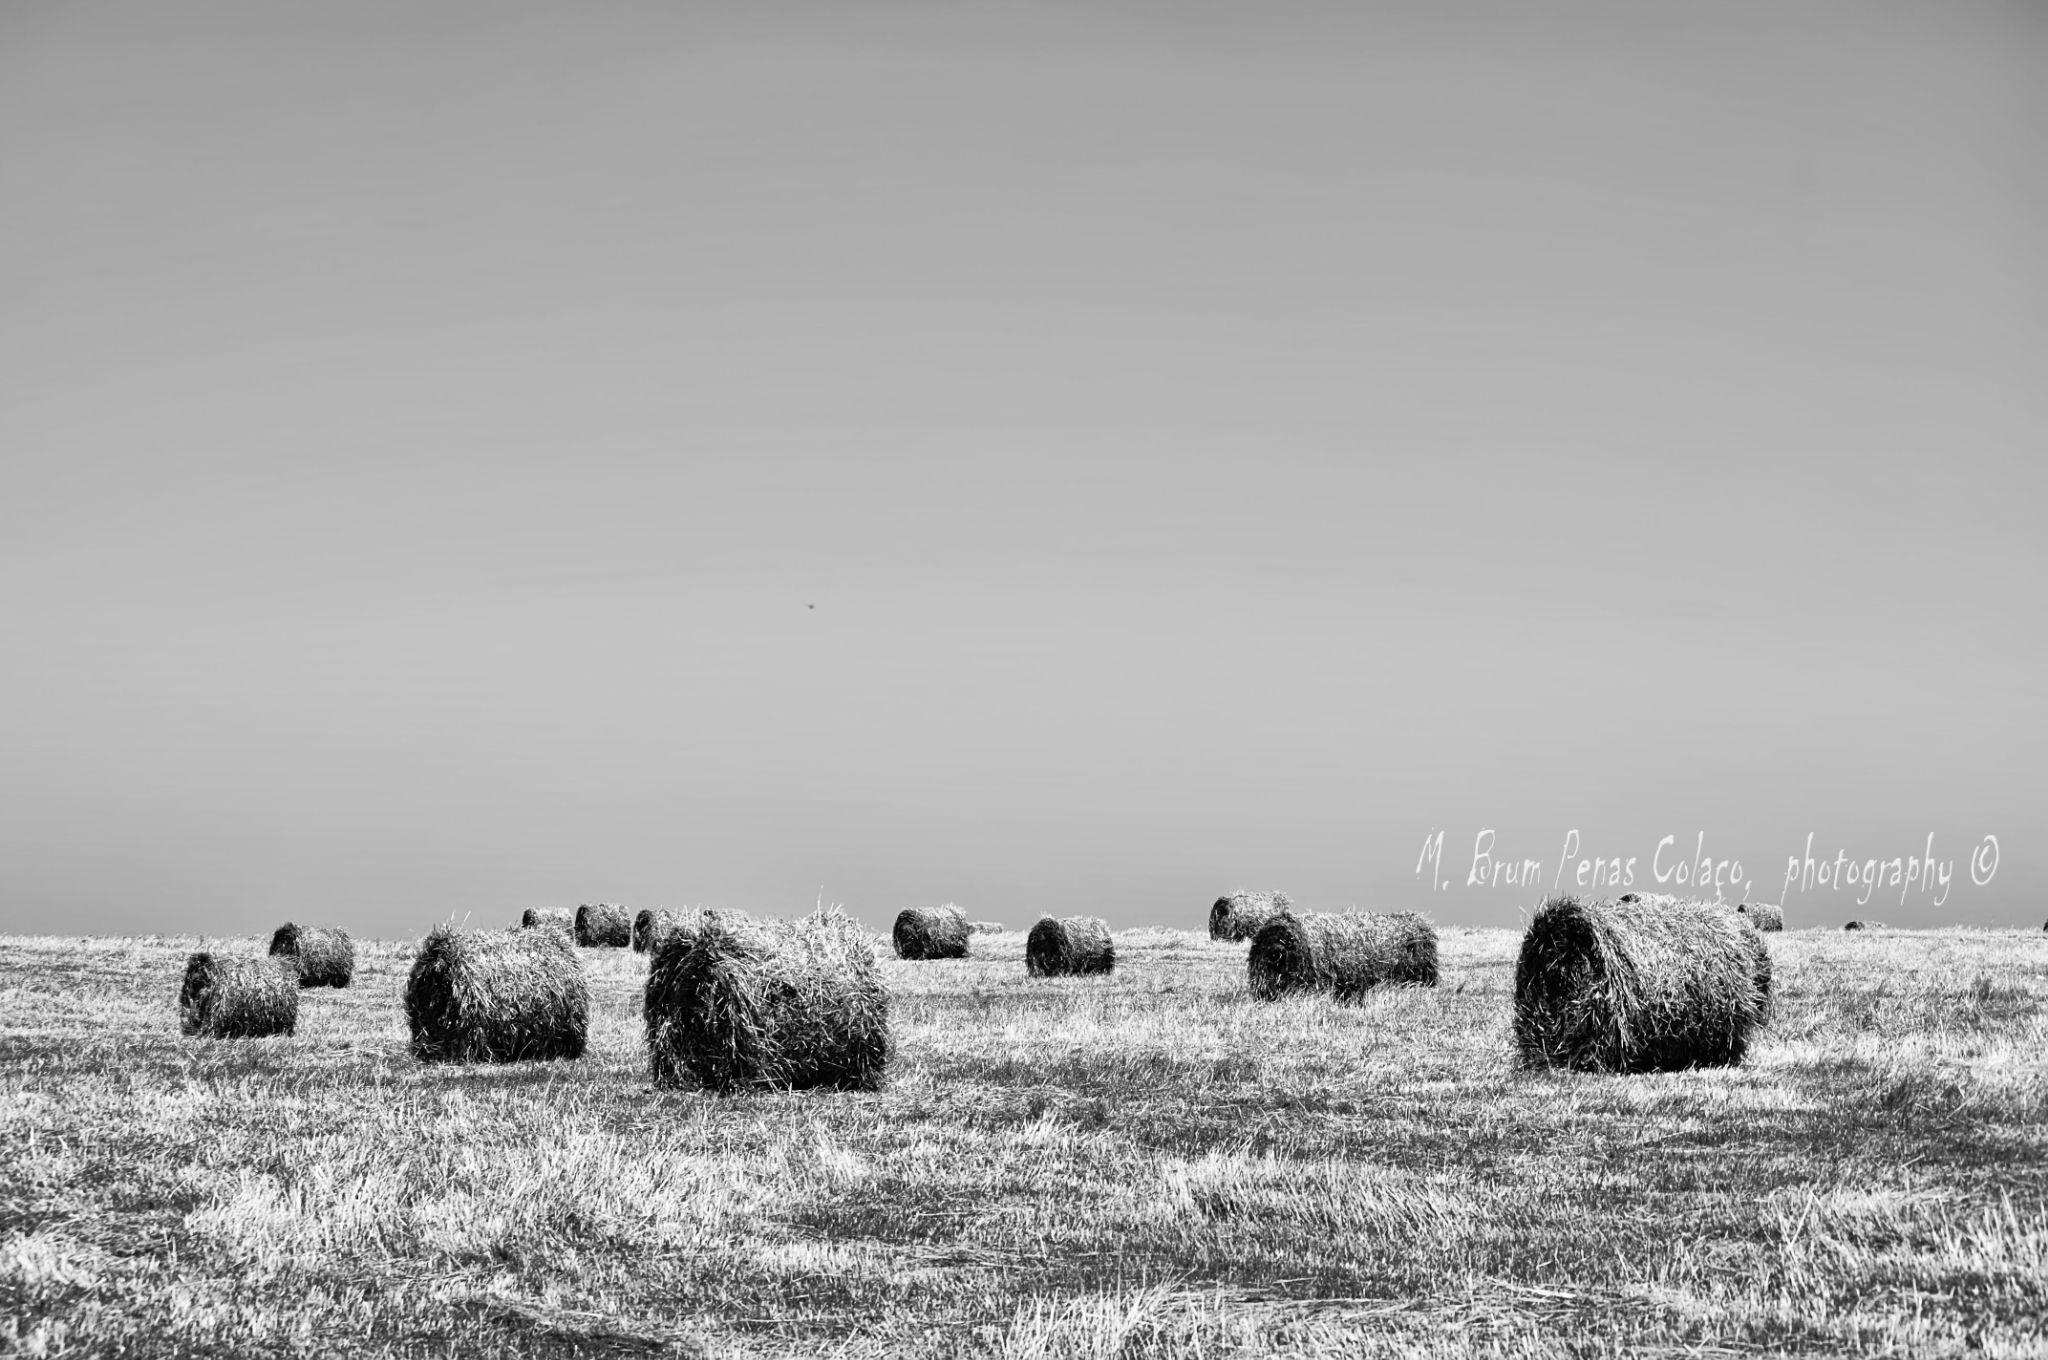 ALENTEJO, land of My Soul by Brum_Colaco